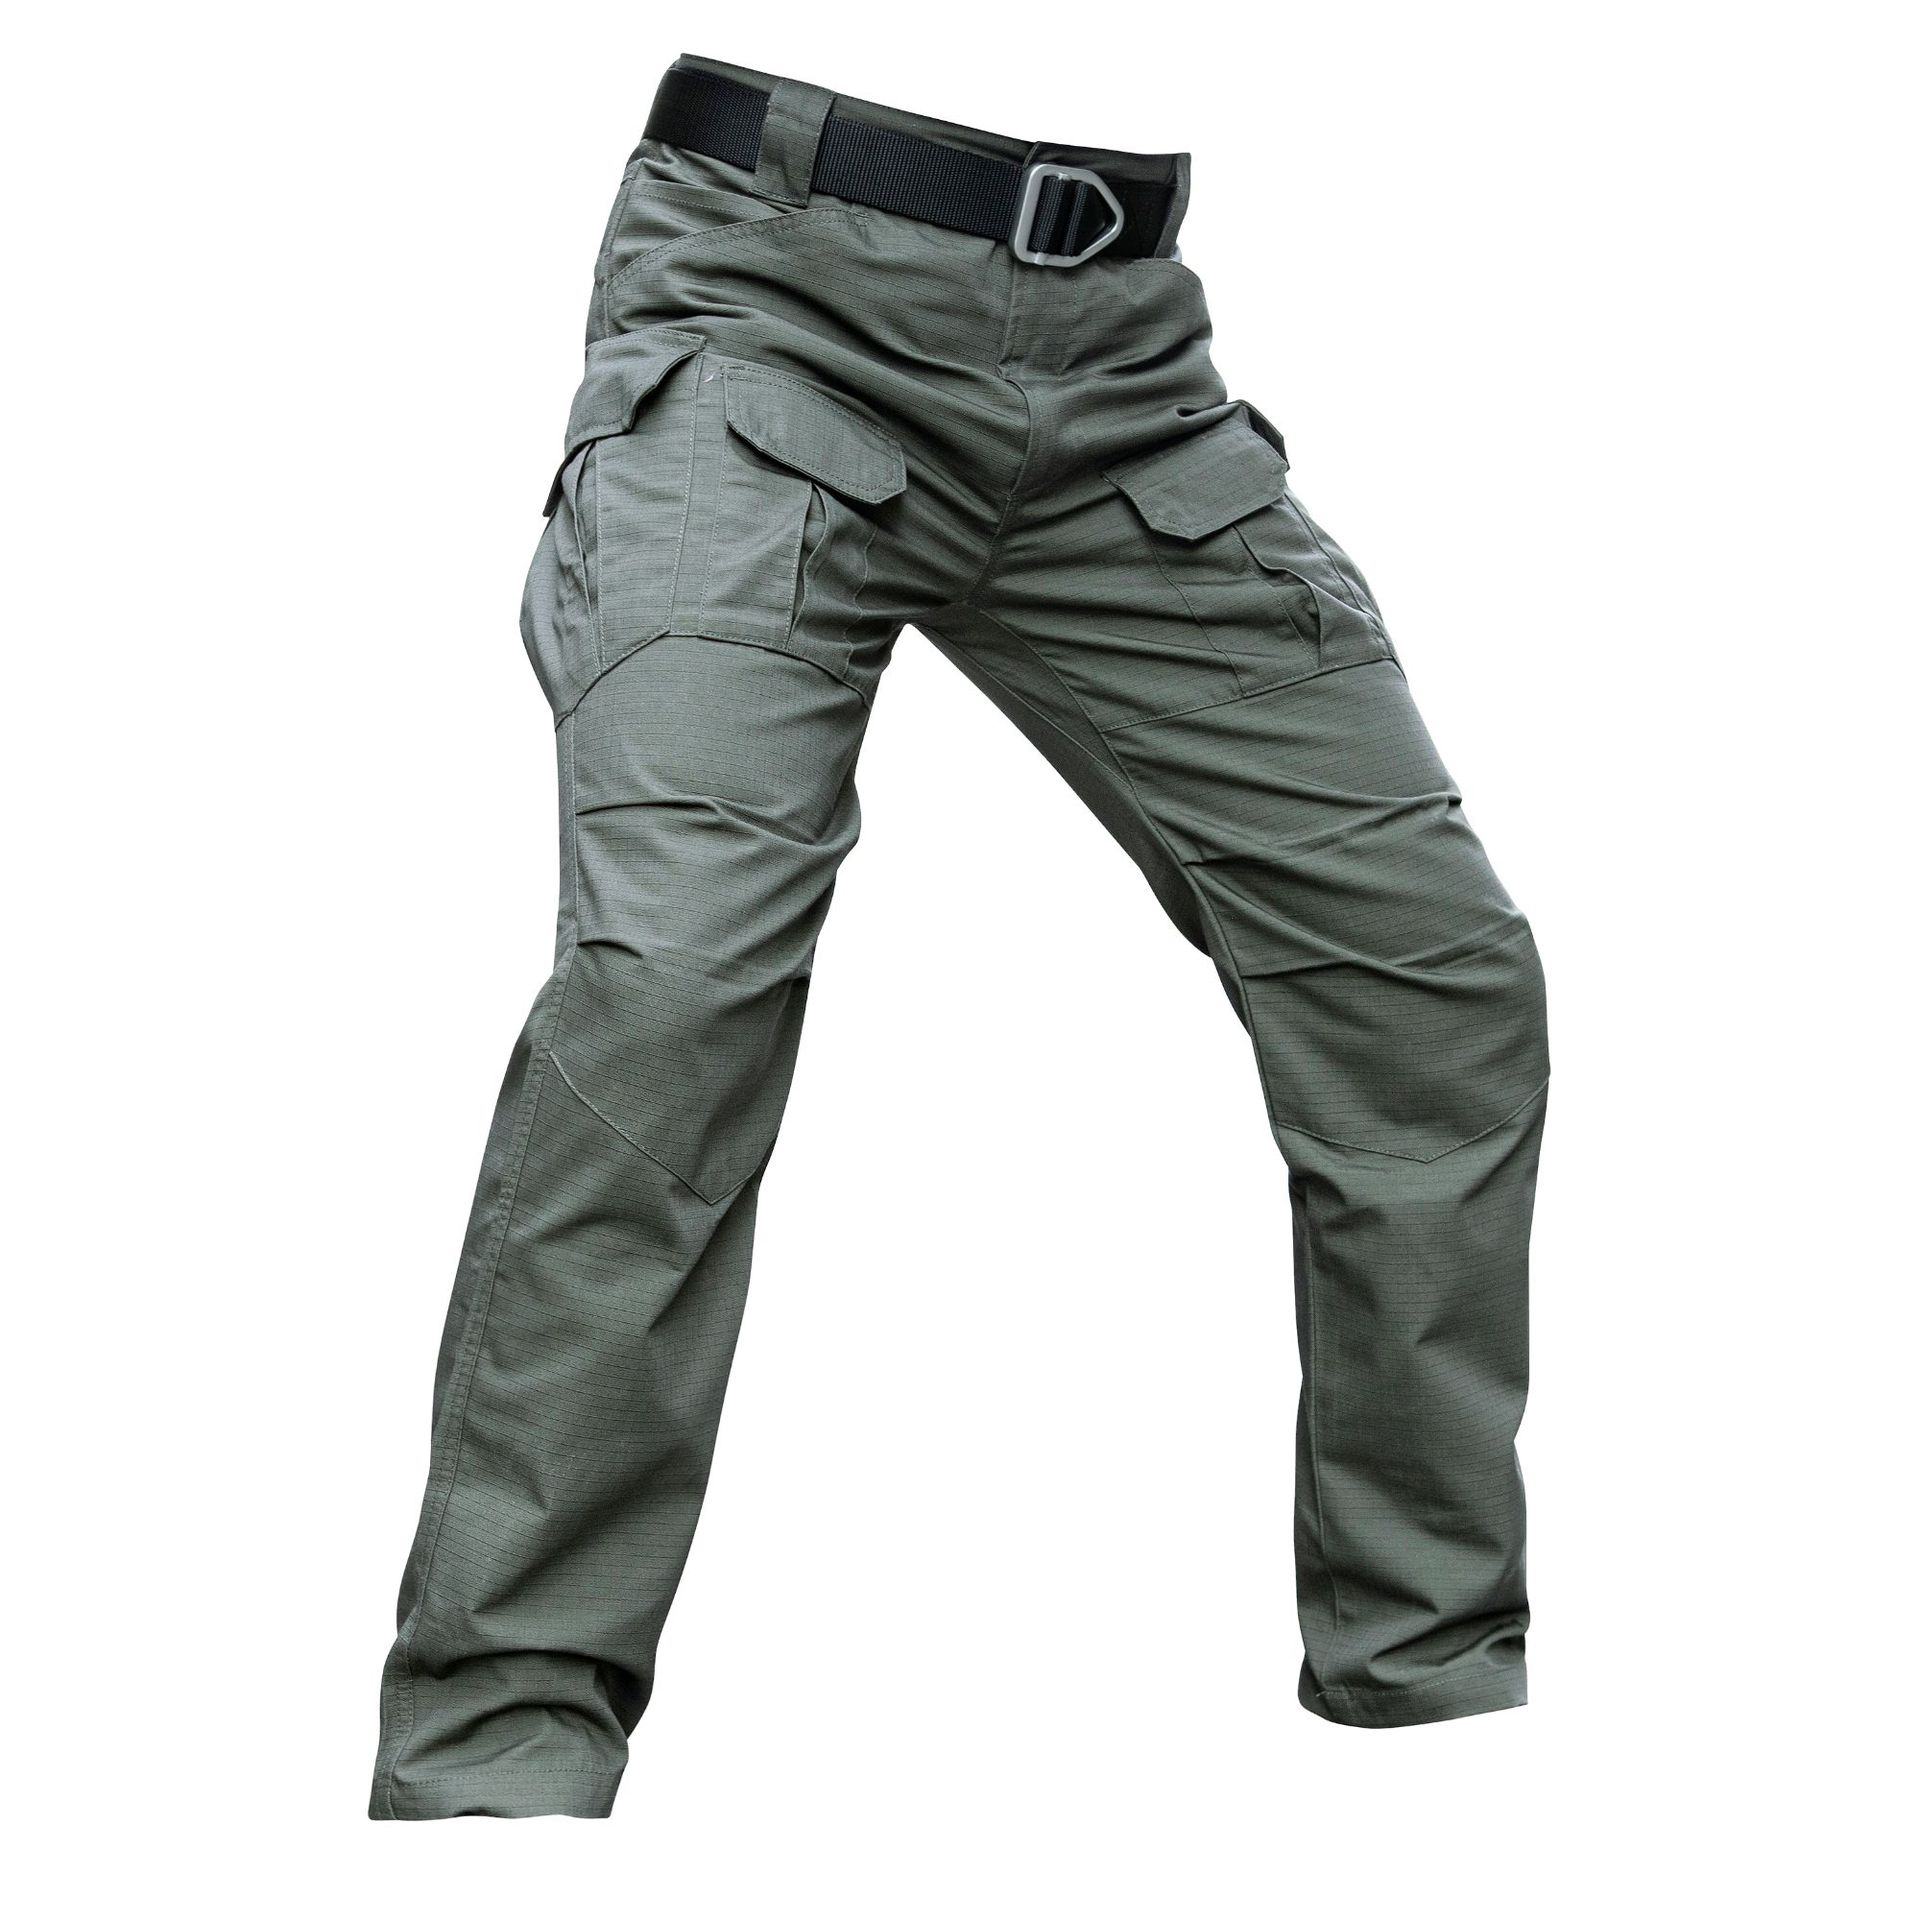 YEVHEY IX8 Cotton Waterproof Tactical Cargo Pants Mens Casual Pants Trousers Army Military Women Pants Moto Biker Safari Men